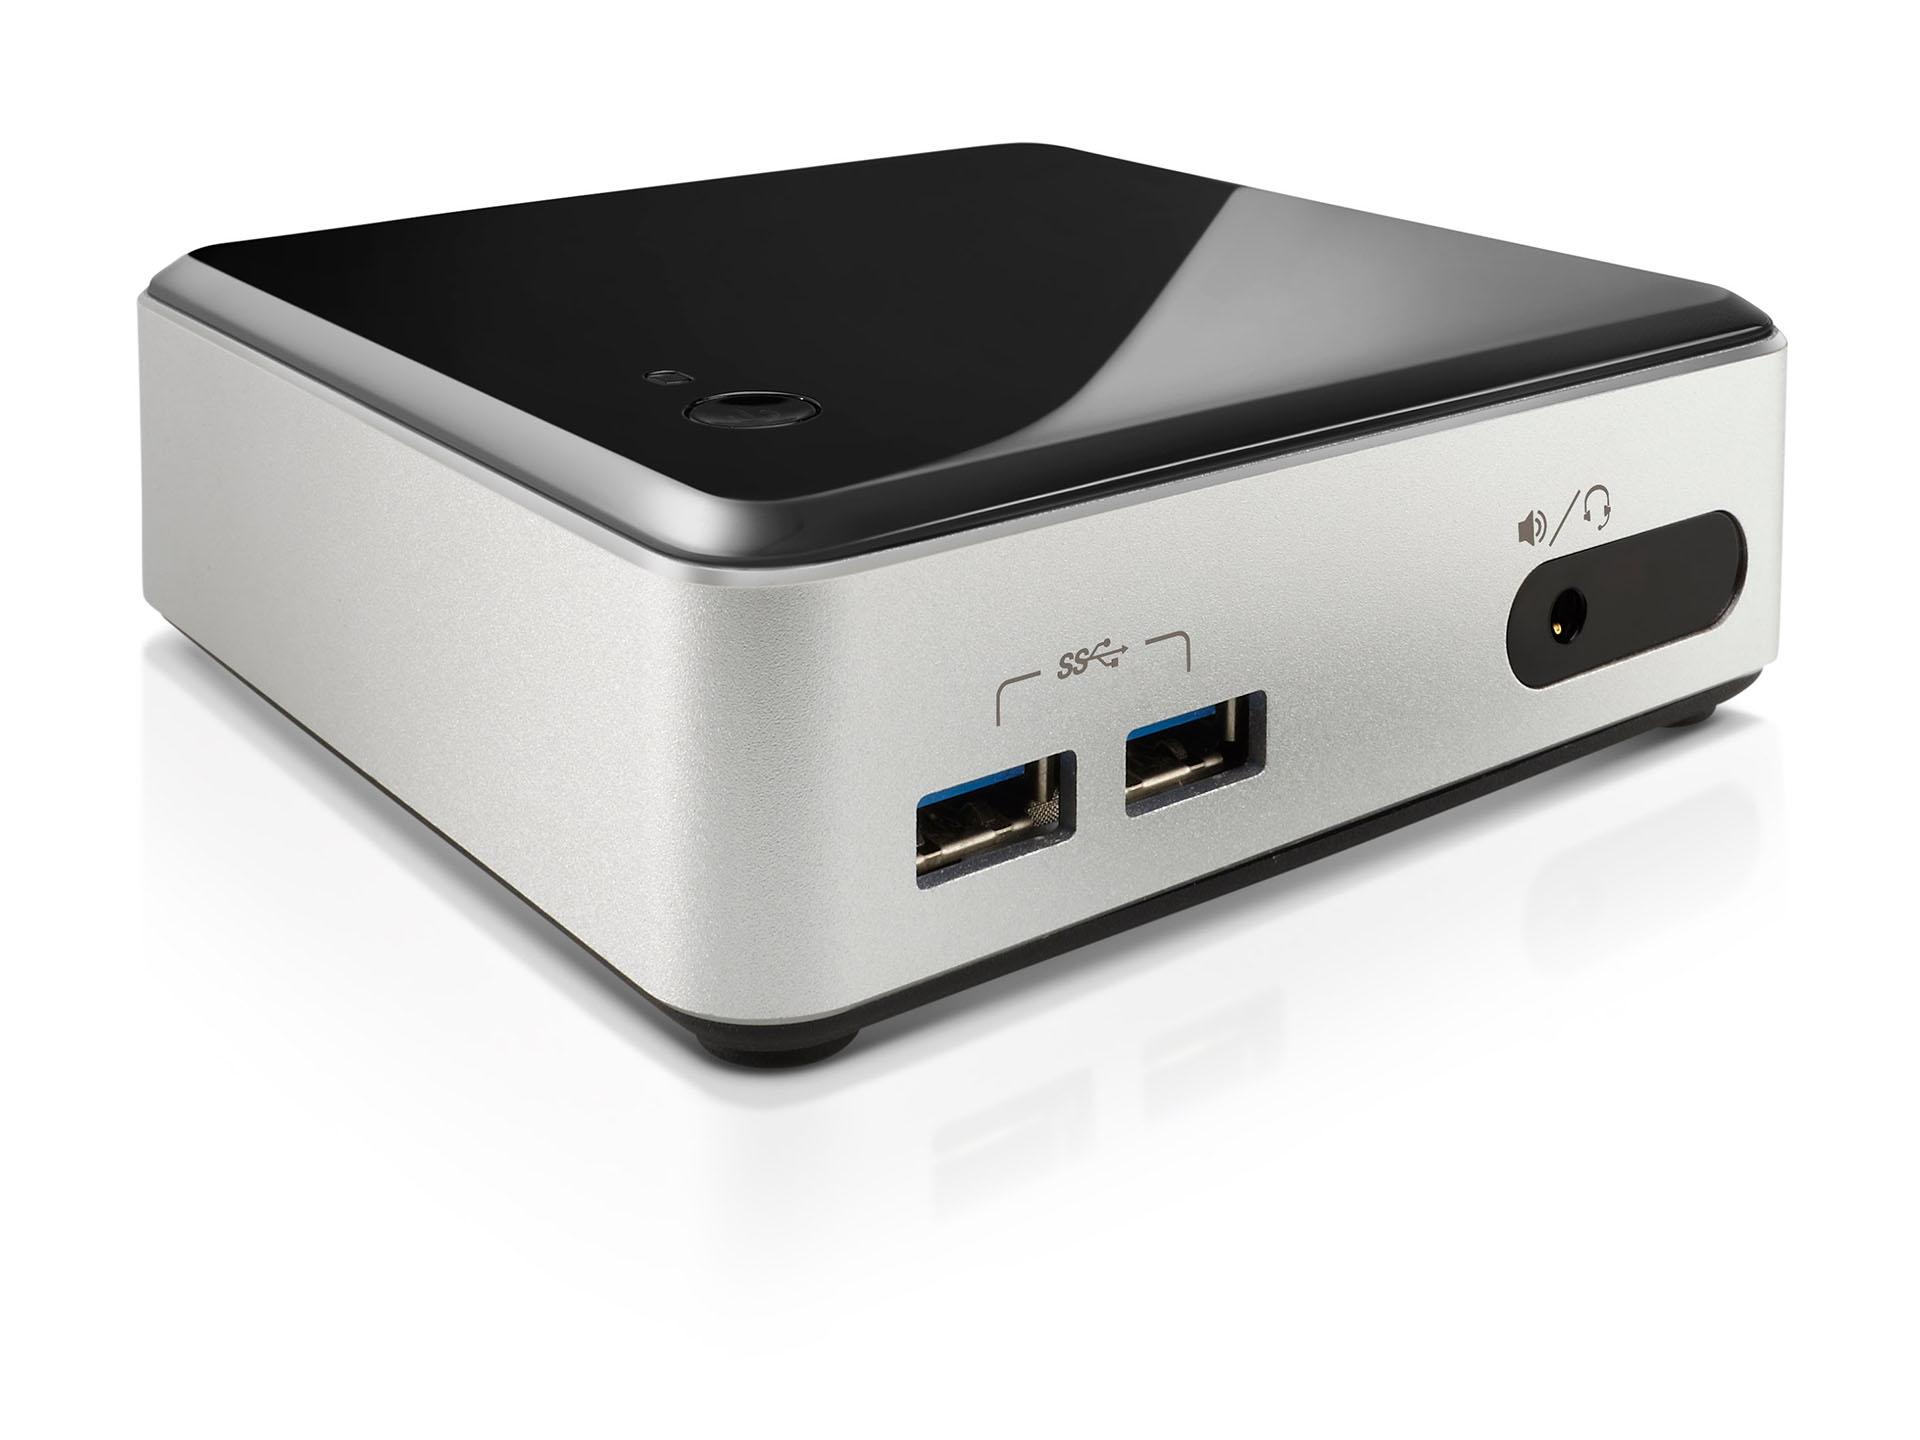 Intel 新版 NUC 巴掌電腦曝光,新增 M.2 介面、USB Charge 功能